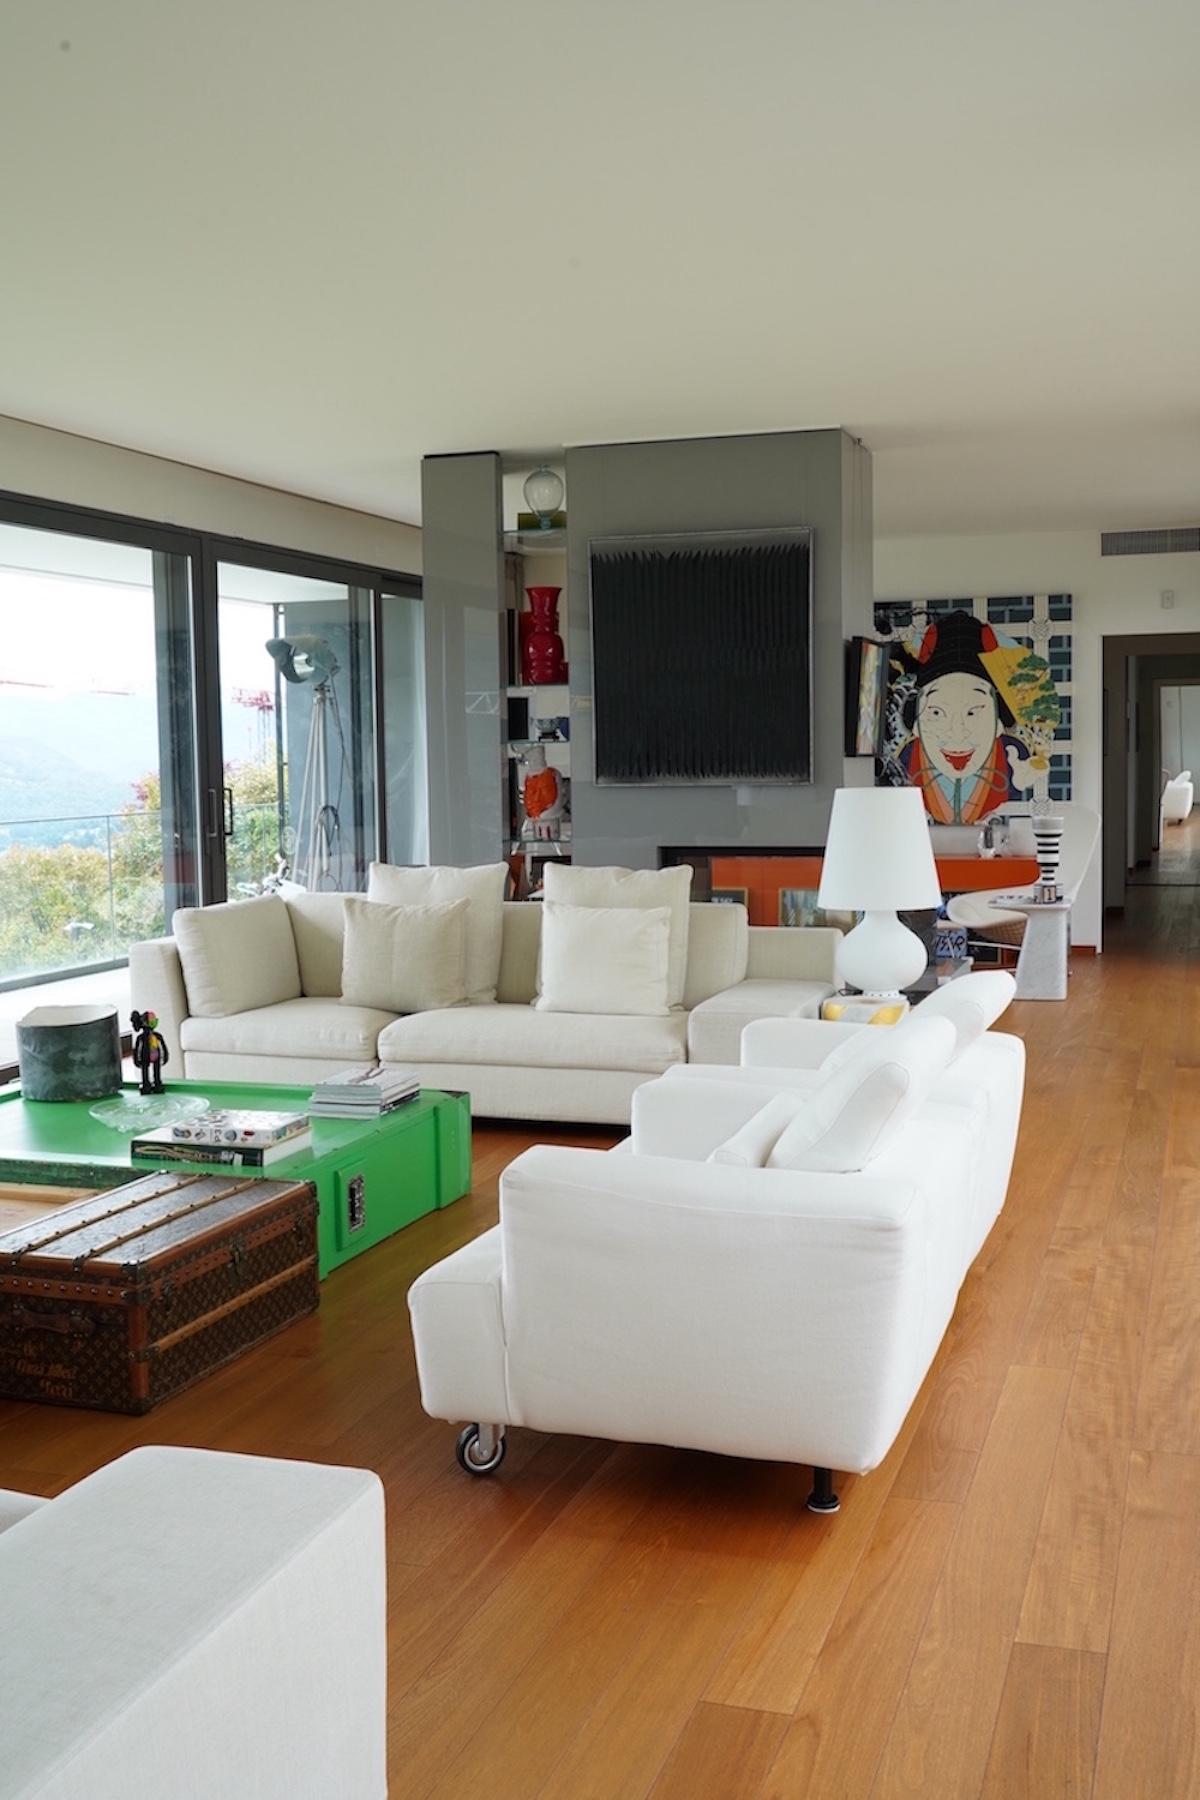 An art-filled living room: Paolo Icaro, Kaws, Sandro Chia (head sculpture in the library), Heinz Mack, Roberto Coda Zabetta, Jonas Mekas (just partially), Ettore Sottsass. Courtesy of Bruno Bolfo.